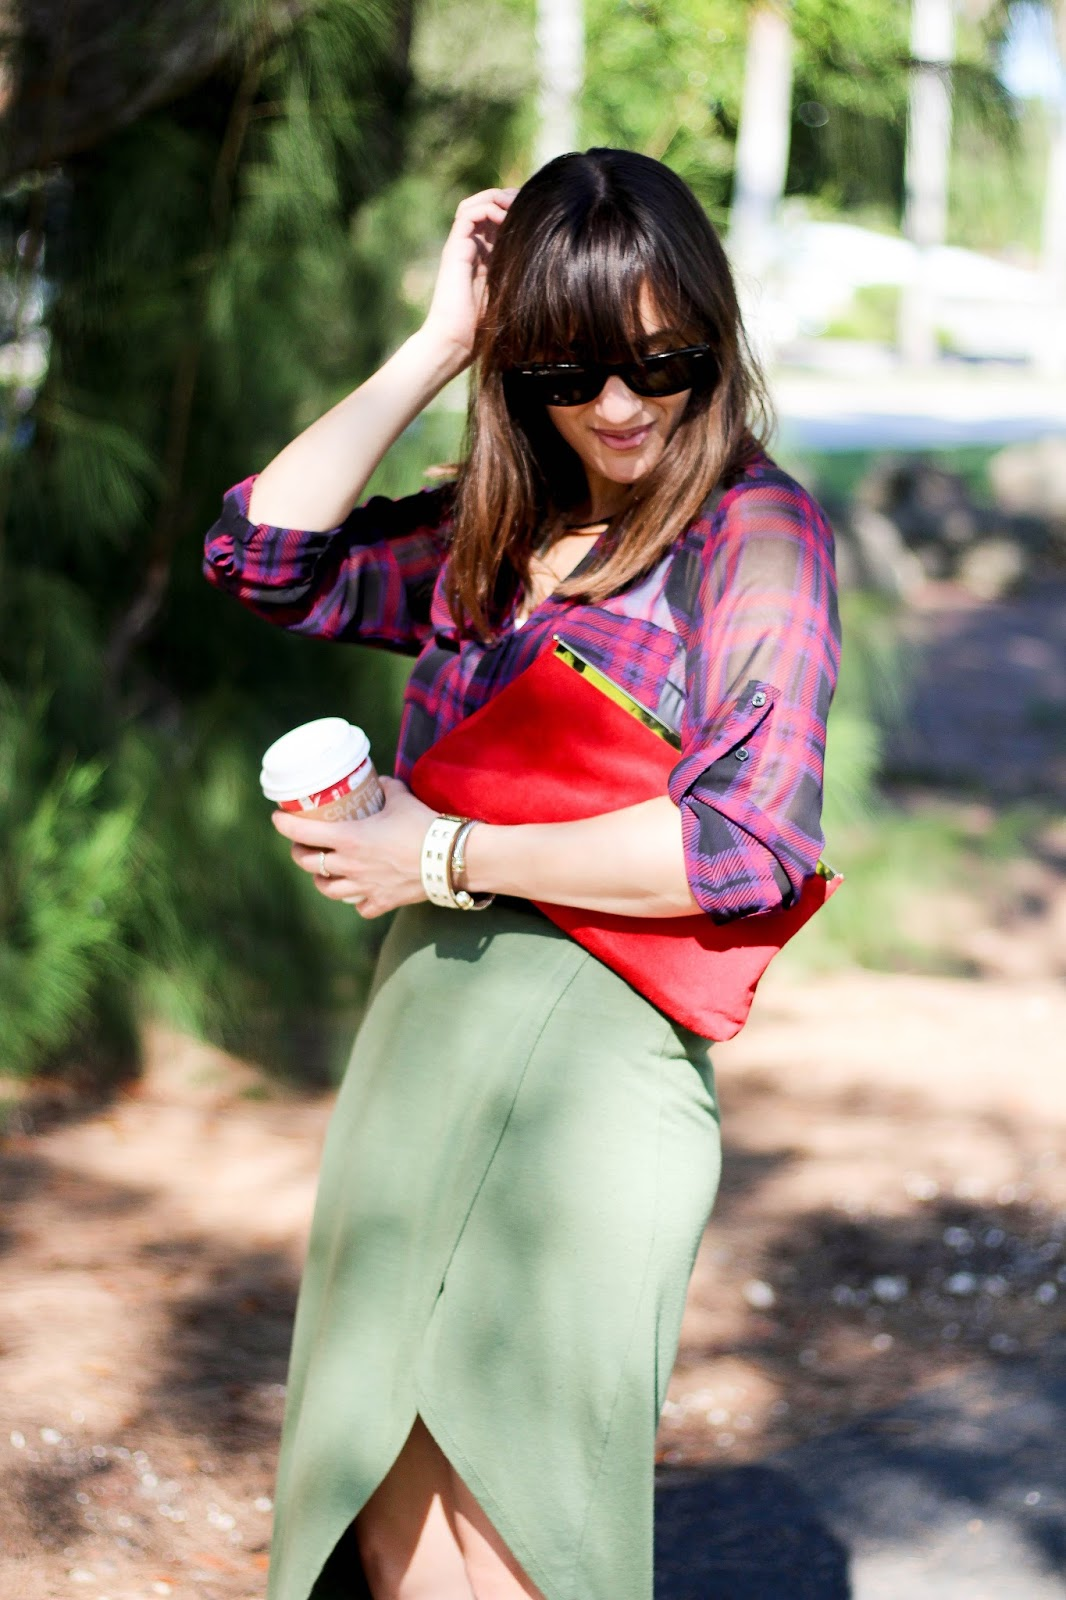 winter capsule, capsule wardrobe, fashion blogger, style blogger, Miami fashion blogger, New York fashion blogger, outfit ideas, winter outfit ideas, winter looks, blogger style